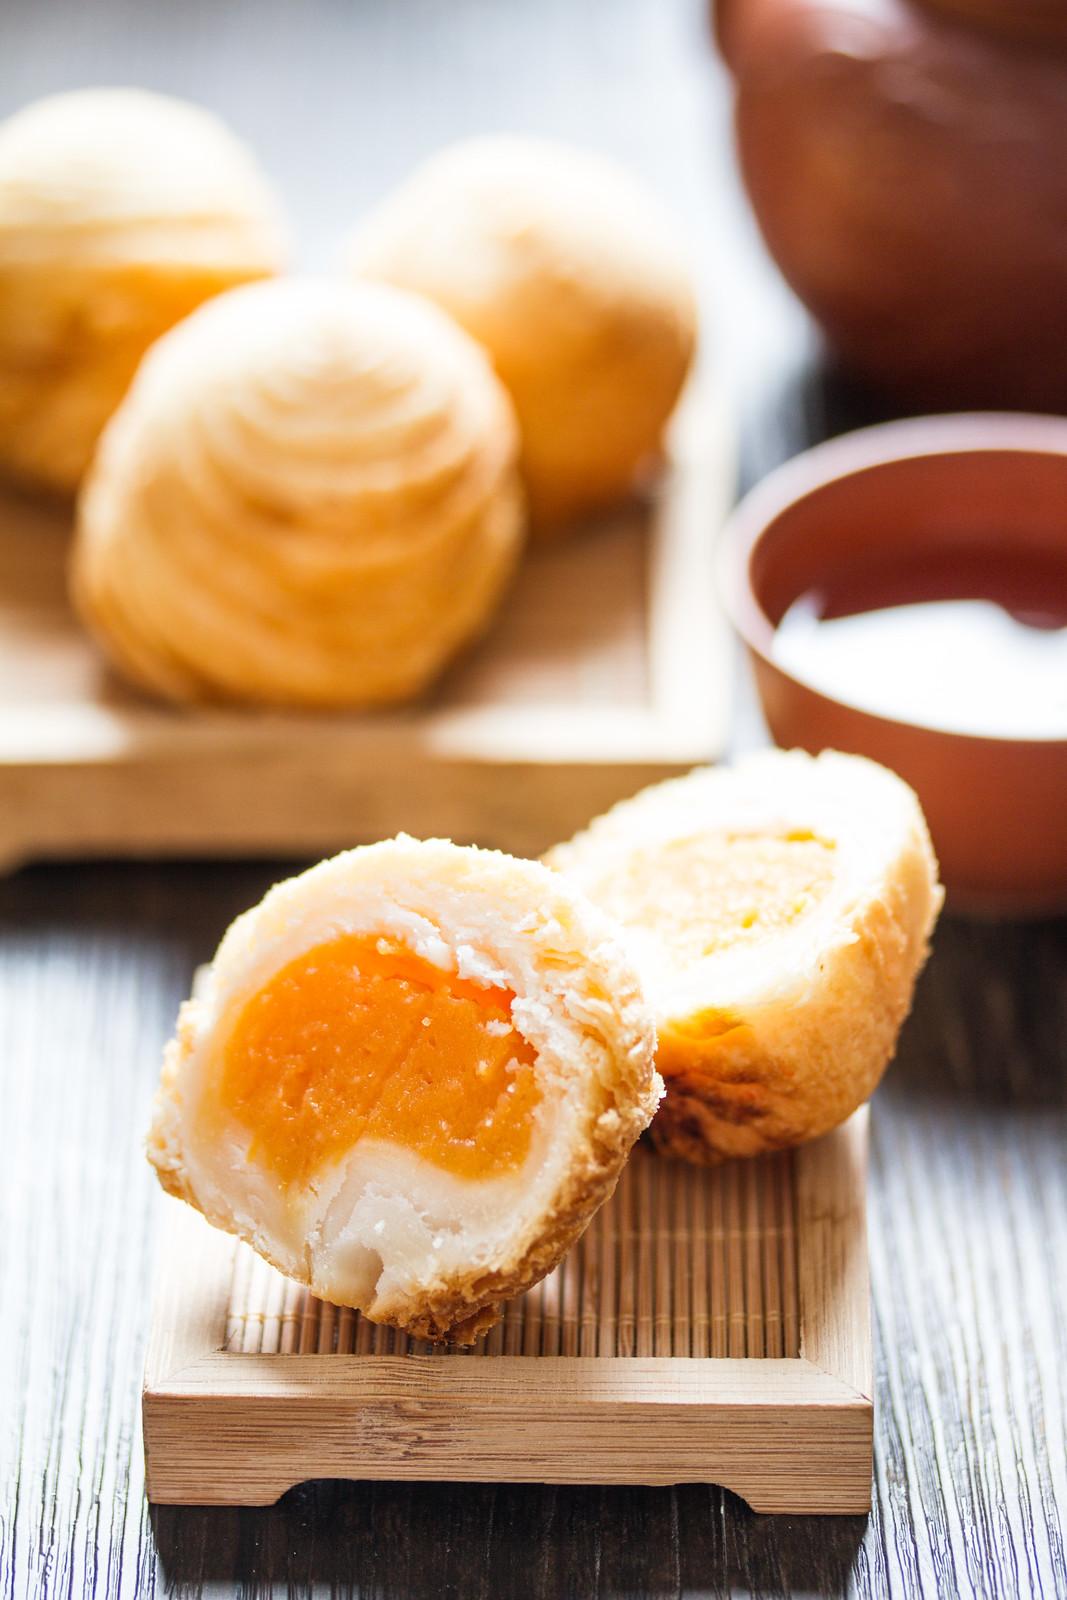 Conrad Centennial Singapore Mooncakes: Golden Peony's signature Sweet Potato Mooncake in Crispy Filo Pastry